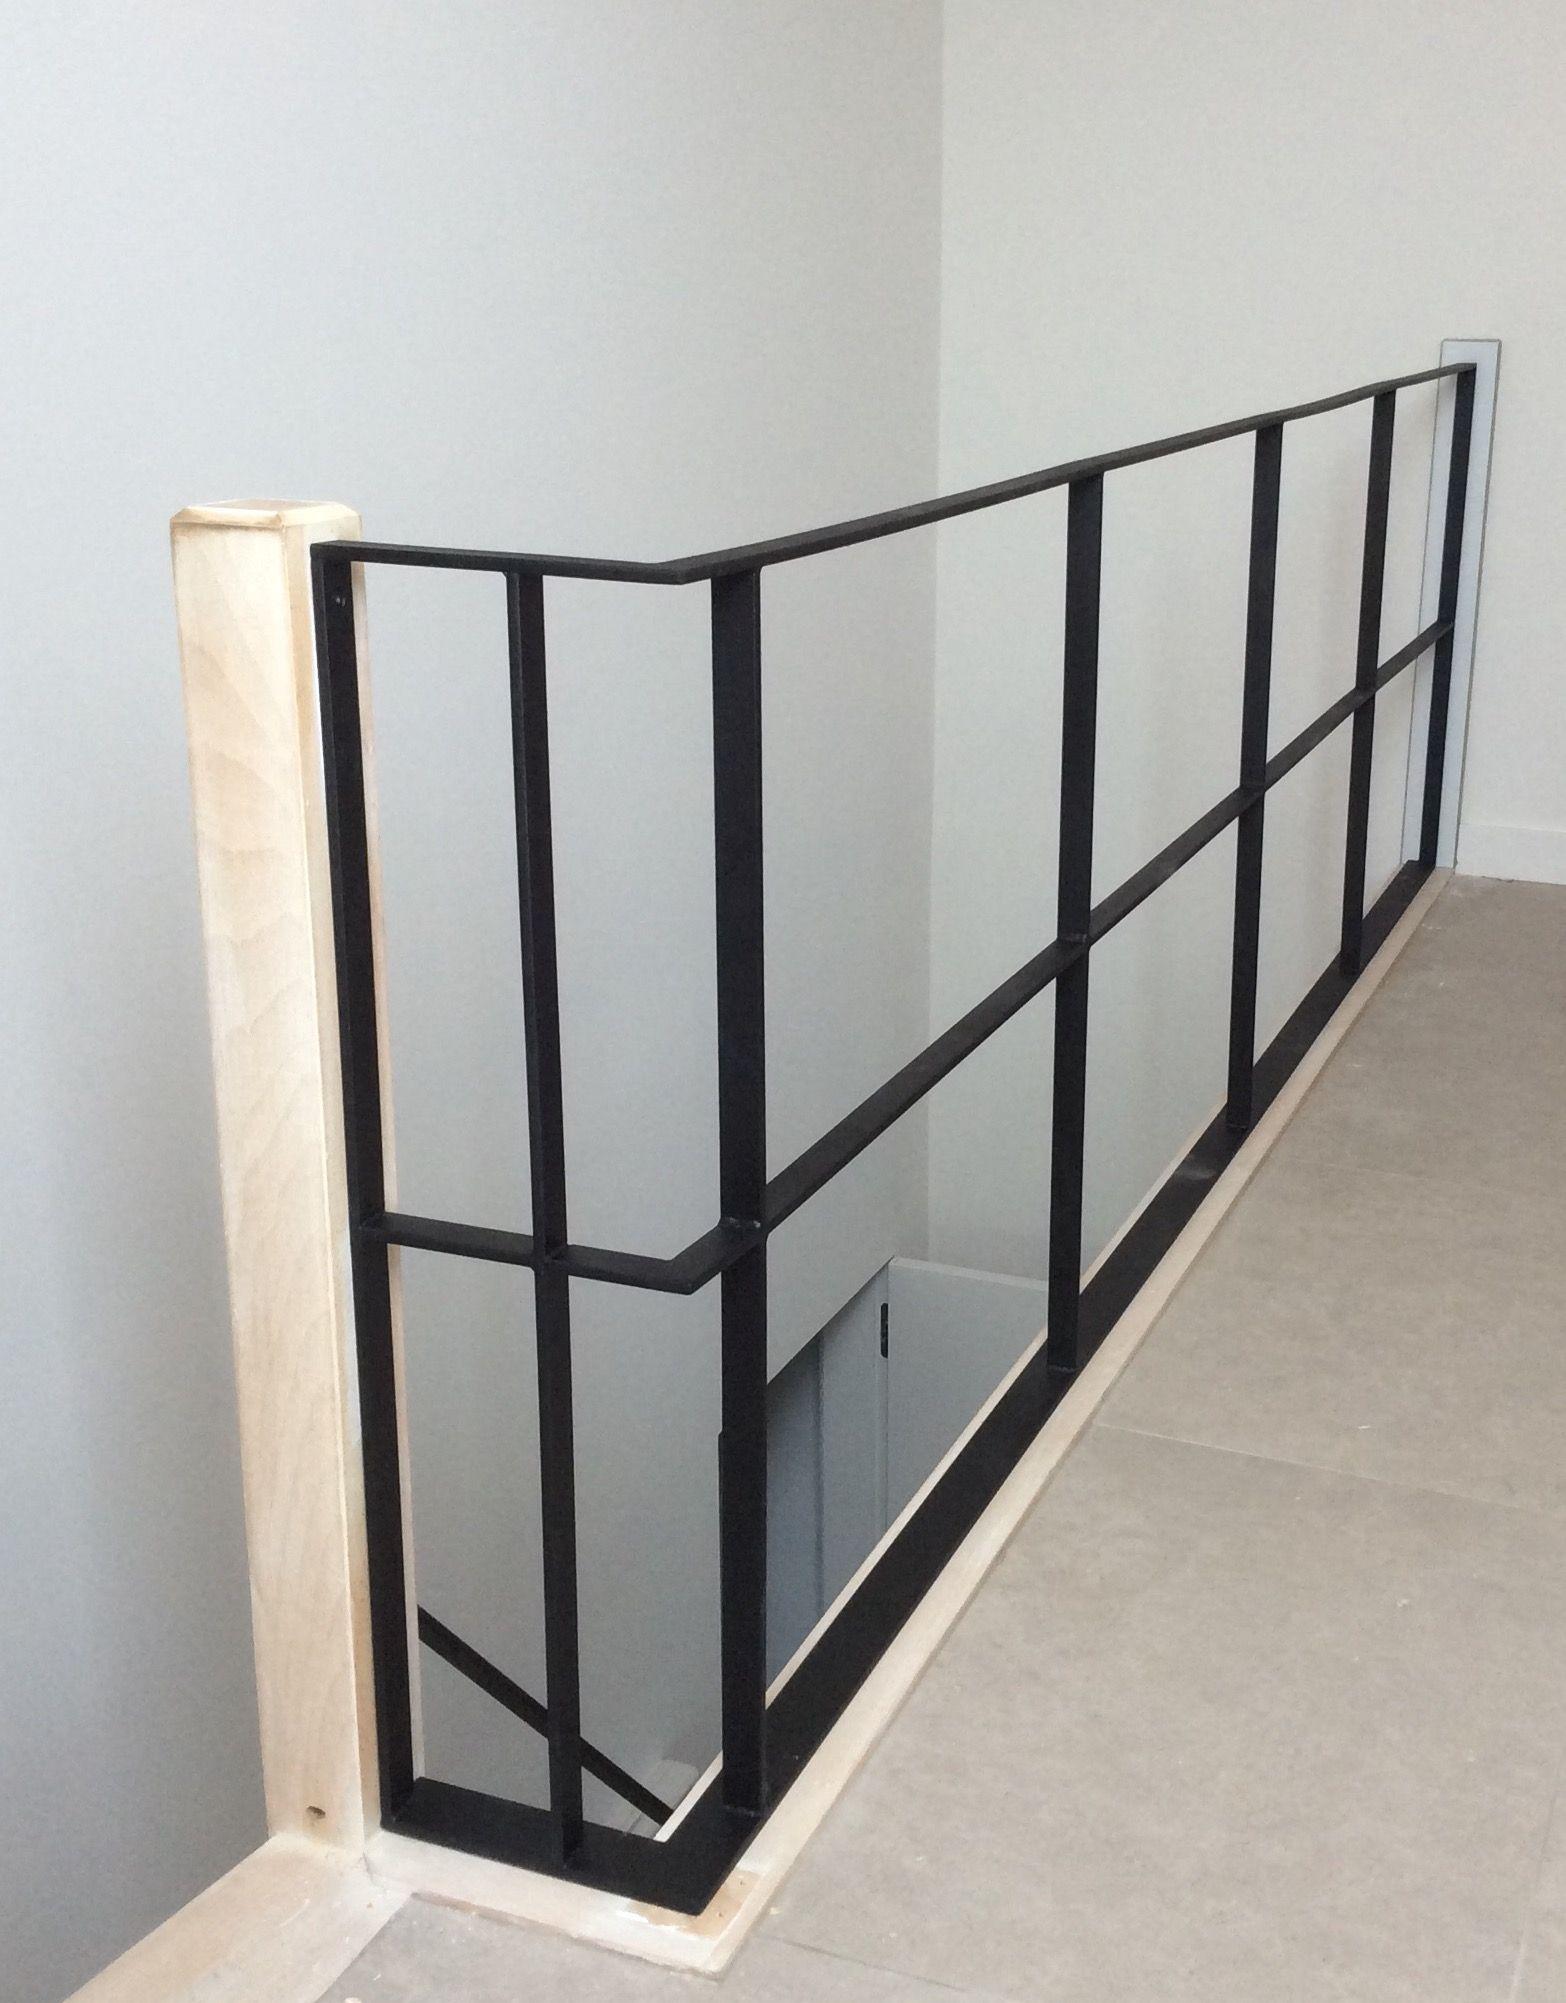 Strakke trapleuning en bijhorende balustrade in zwarte for Balustrade trap